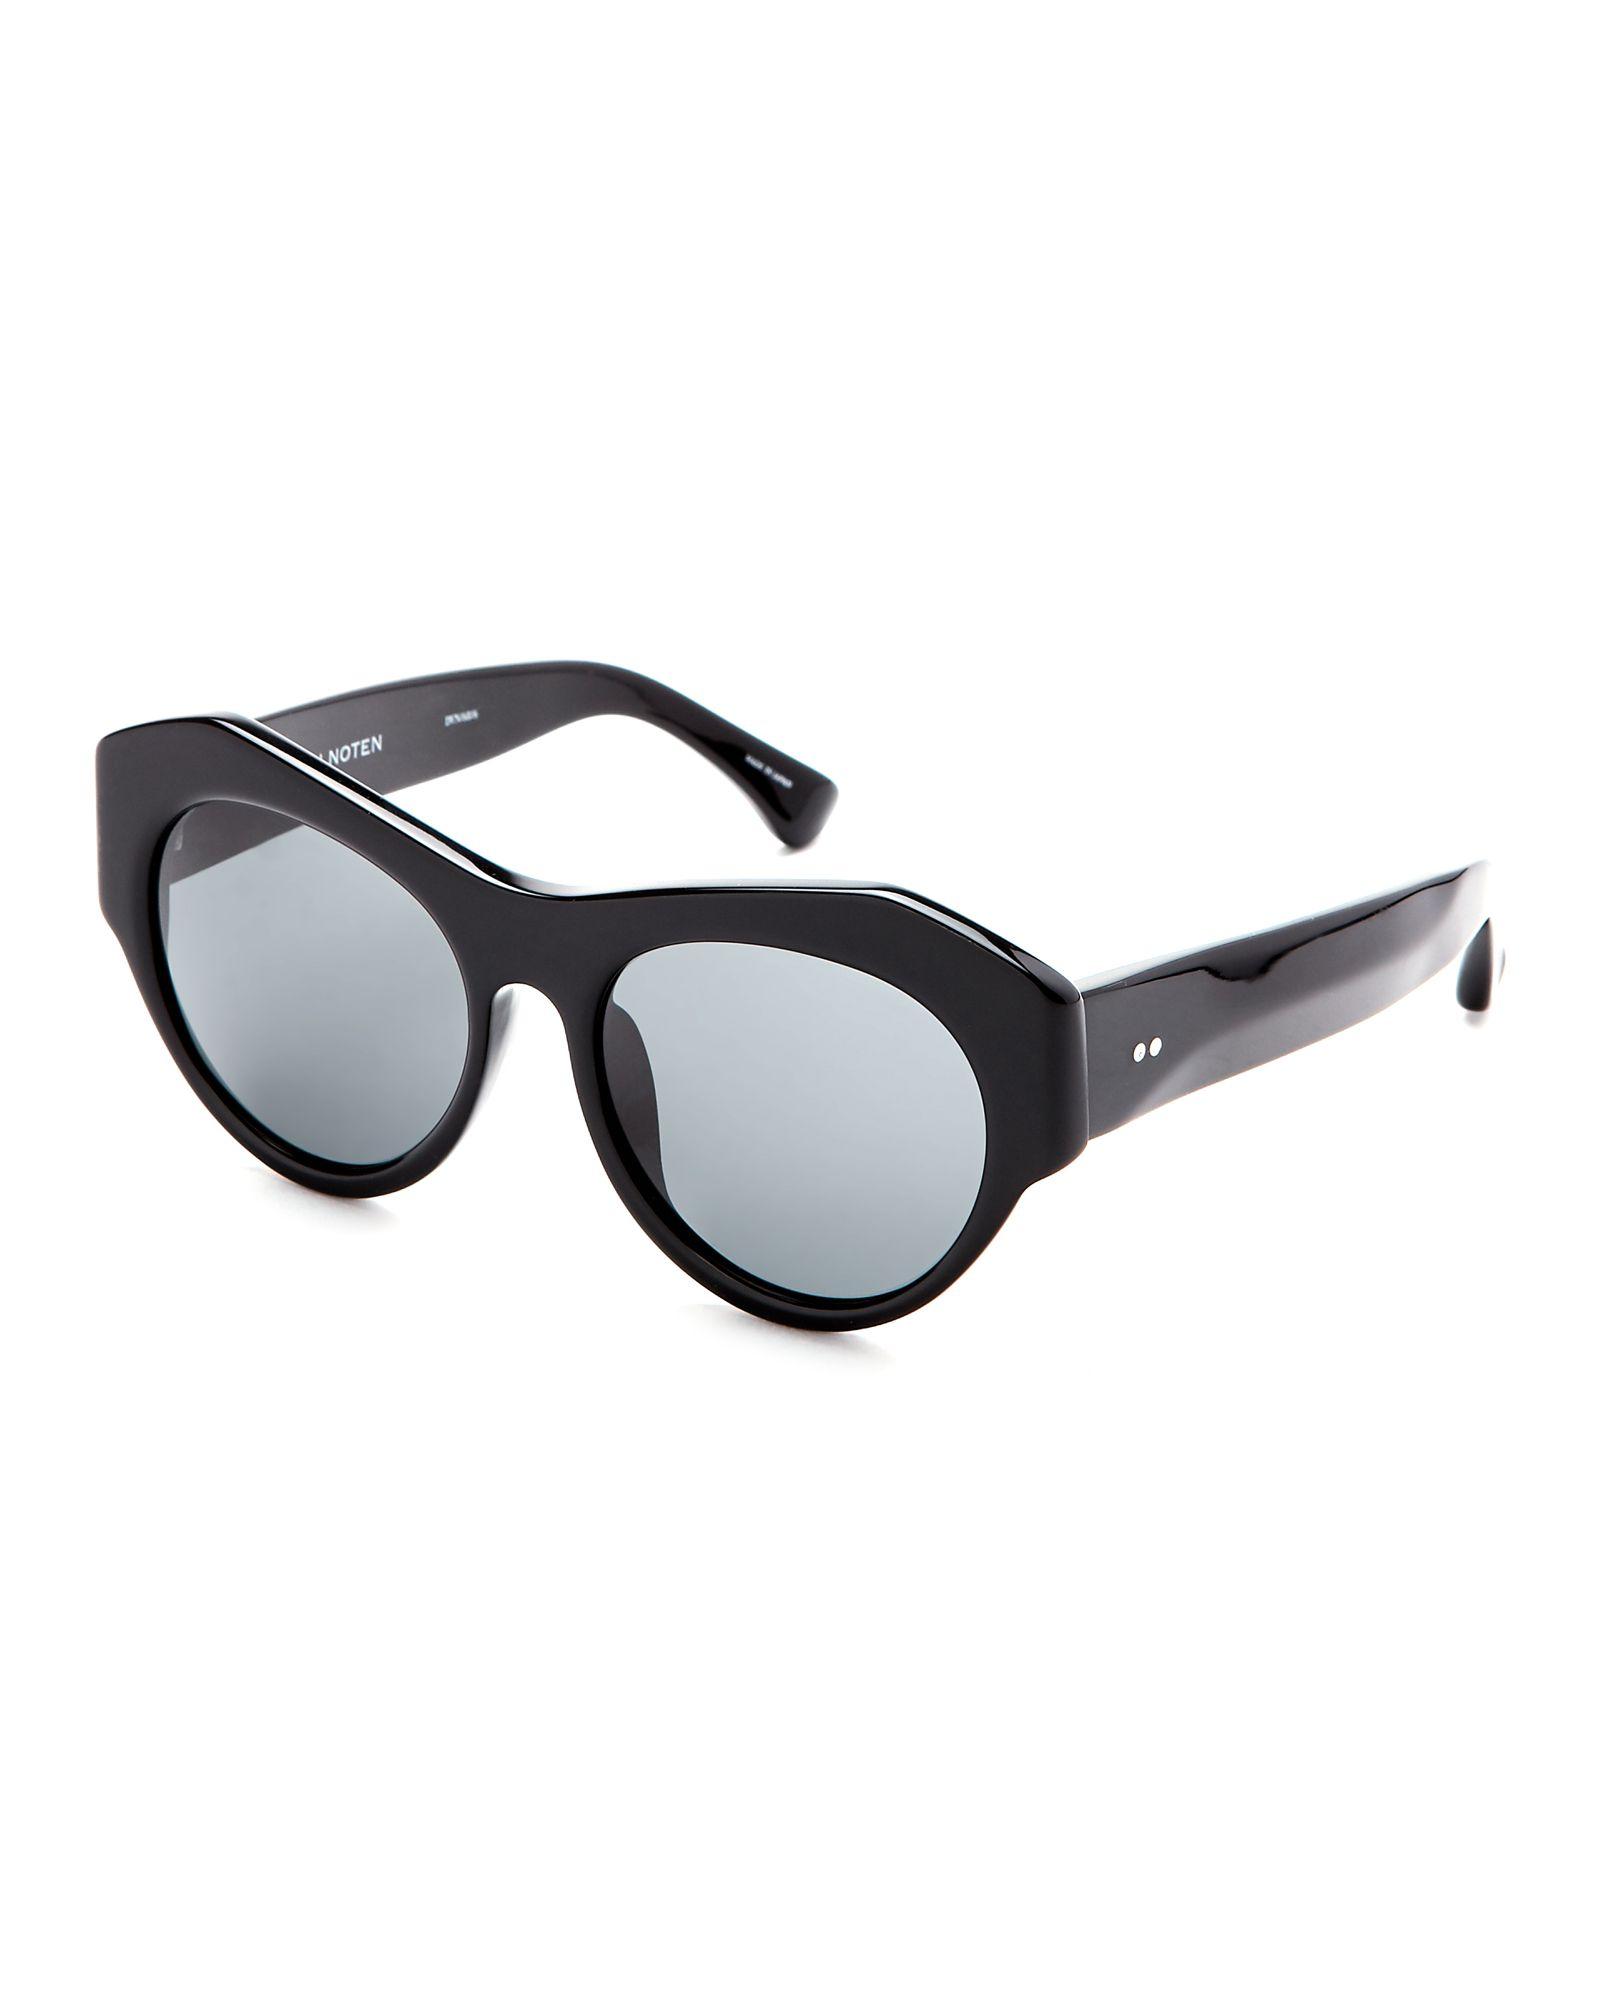 bd40d6cb16b2 Dries Van Noten X Linda Farrow Black DVN68 Cat Eye Sunglasses ...